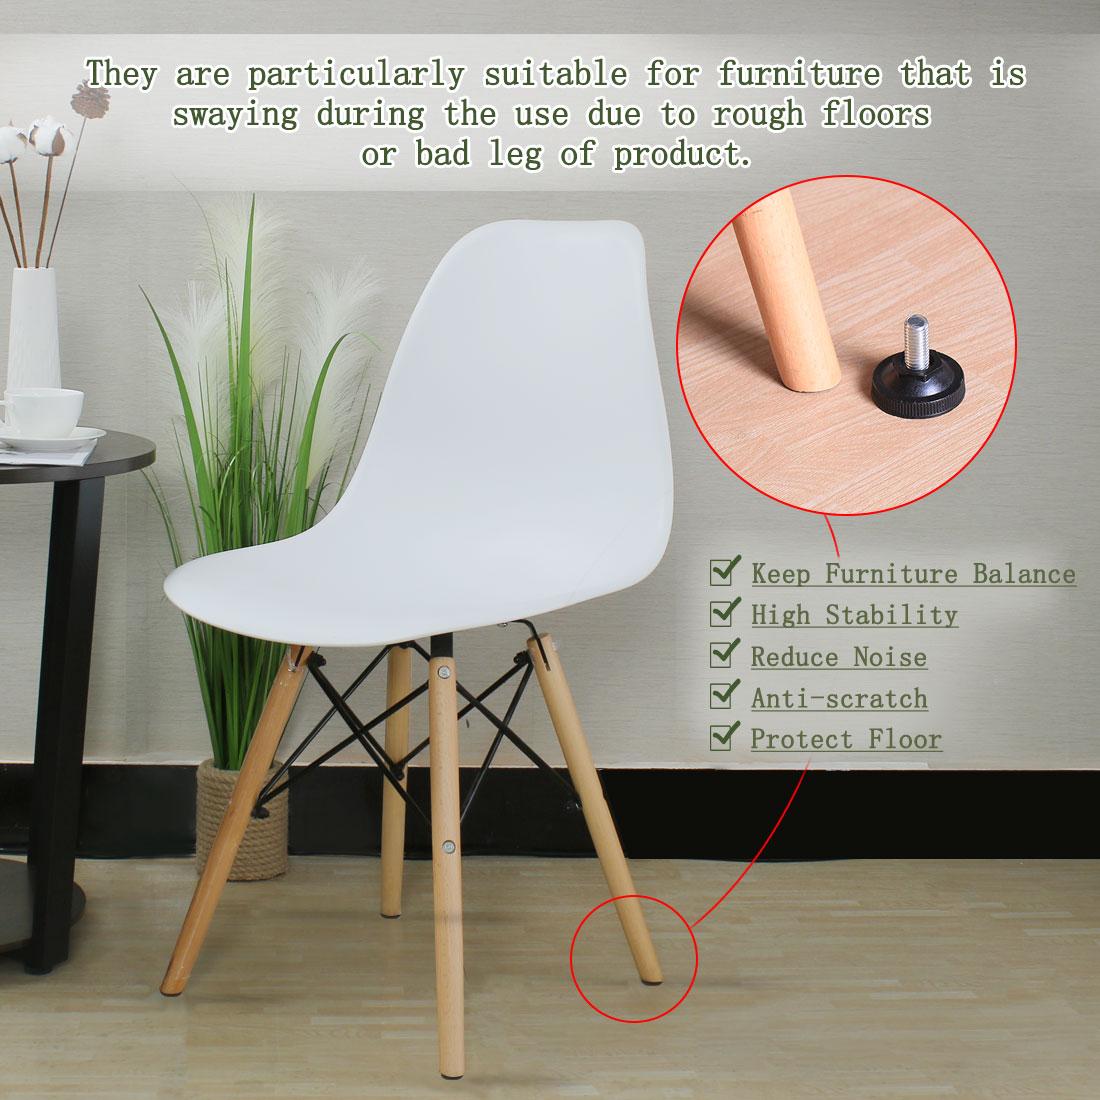 M10 x 20 x 37mm Leveling Feet Floor Protector for Home Apartment Sofa Leg 12pcs - image 5 de 7